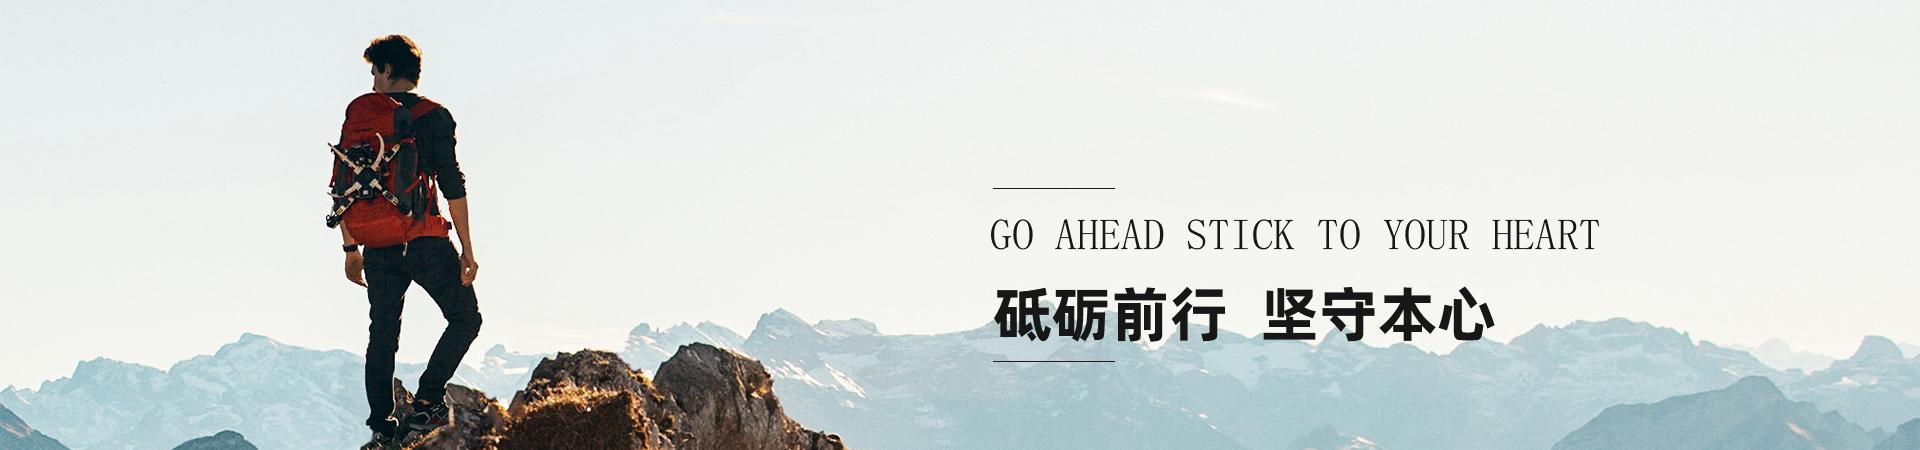 http://www.zjxdfxl.com/data/upload/202007/20200725085721_708.jpg